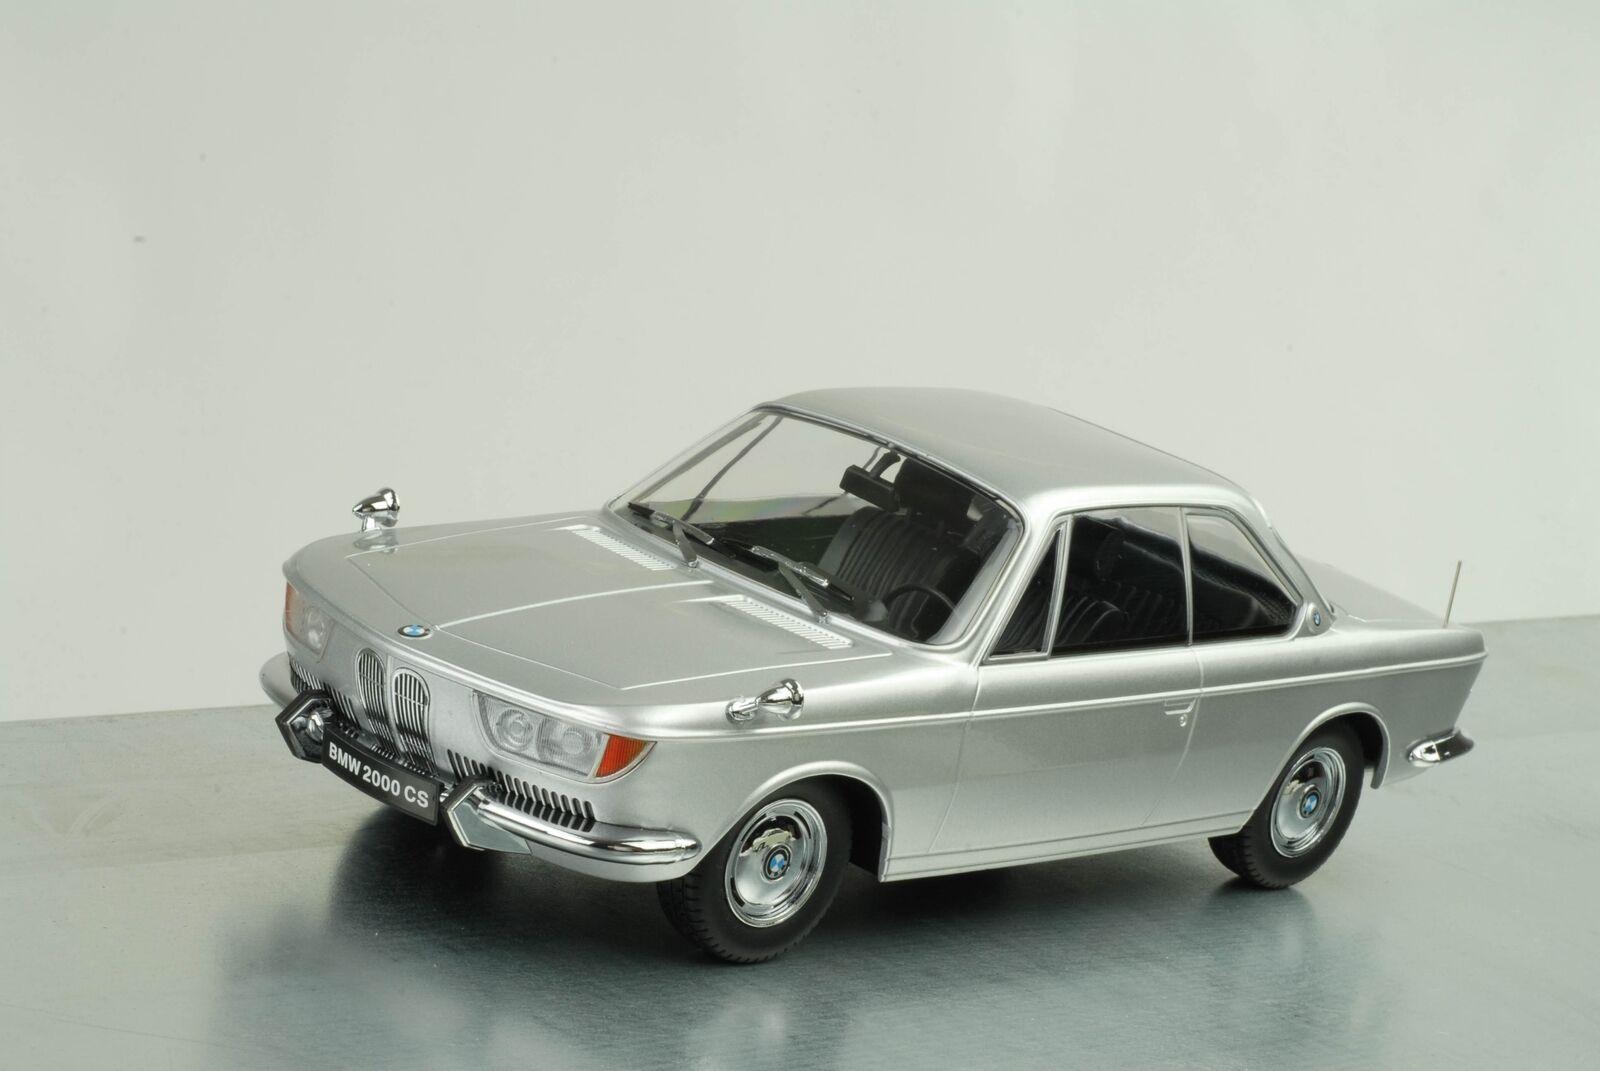 BMW 2000 CS Coupe 1965 bis 1970 Karmann silber 1 18 KK Scale Diecast